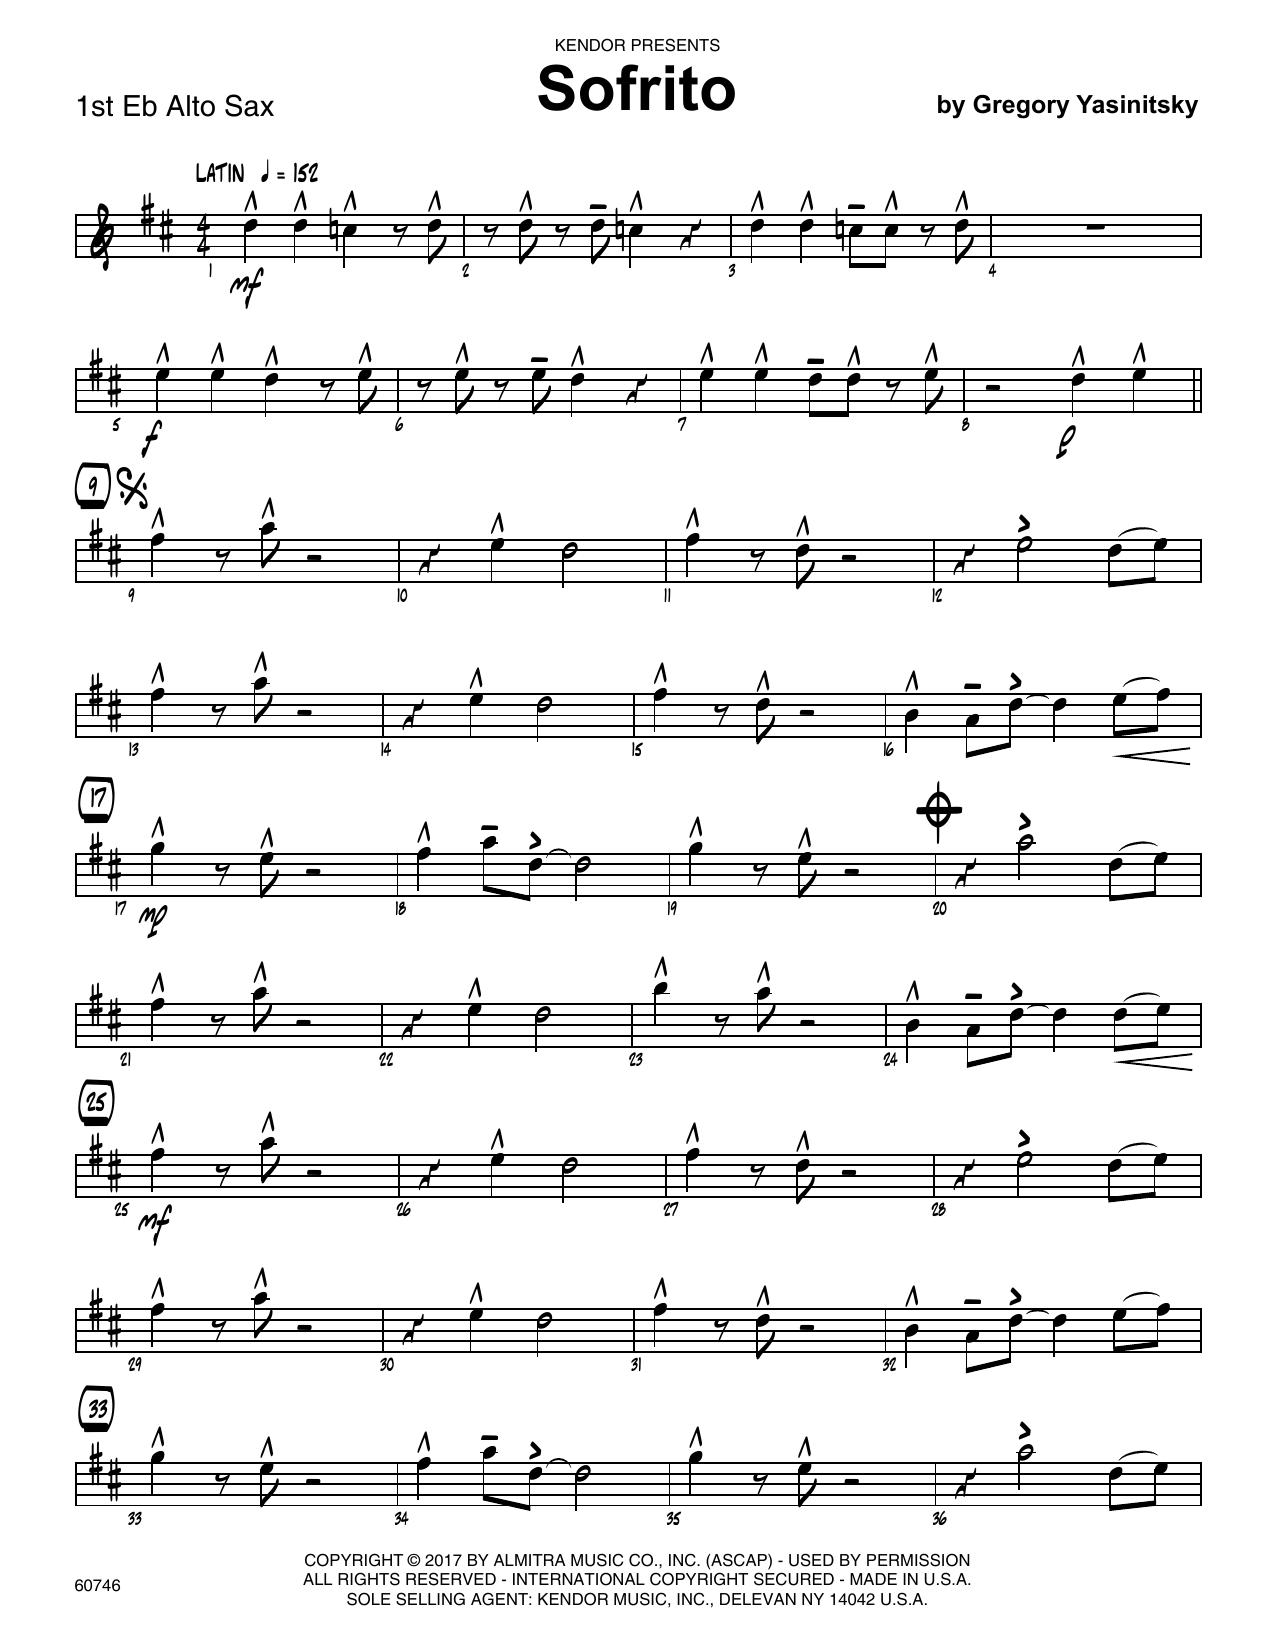 Sofrito - 1st Eb Alto Saxophone Sheet Music